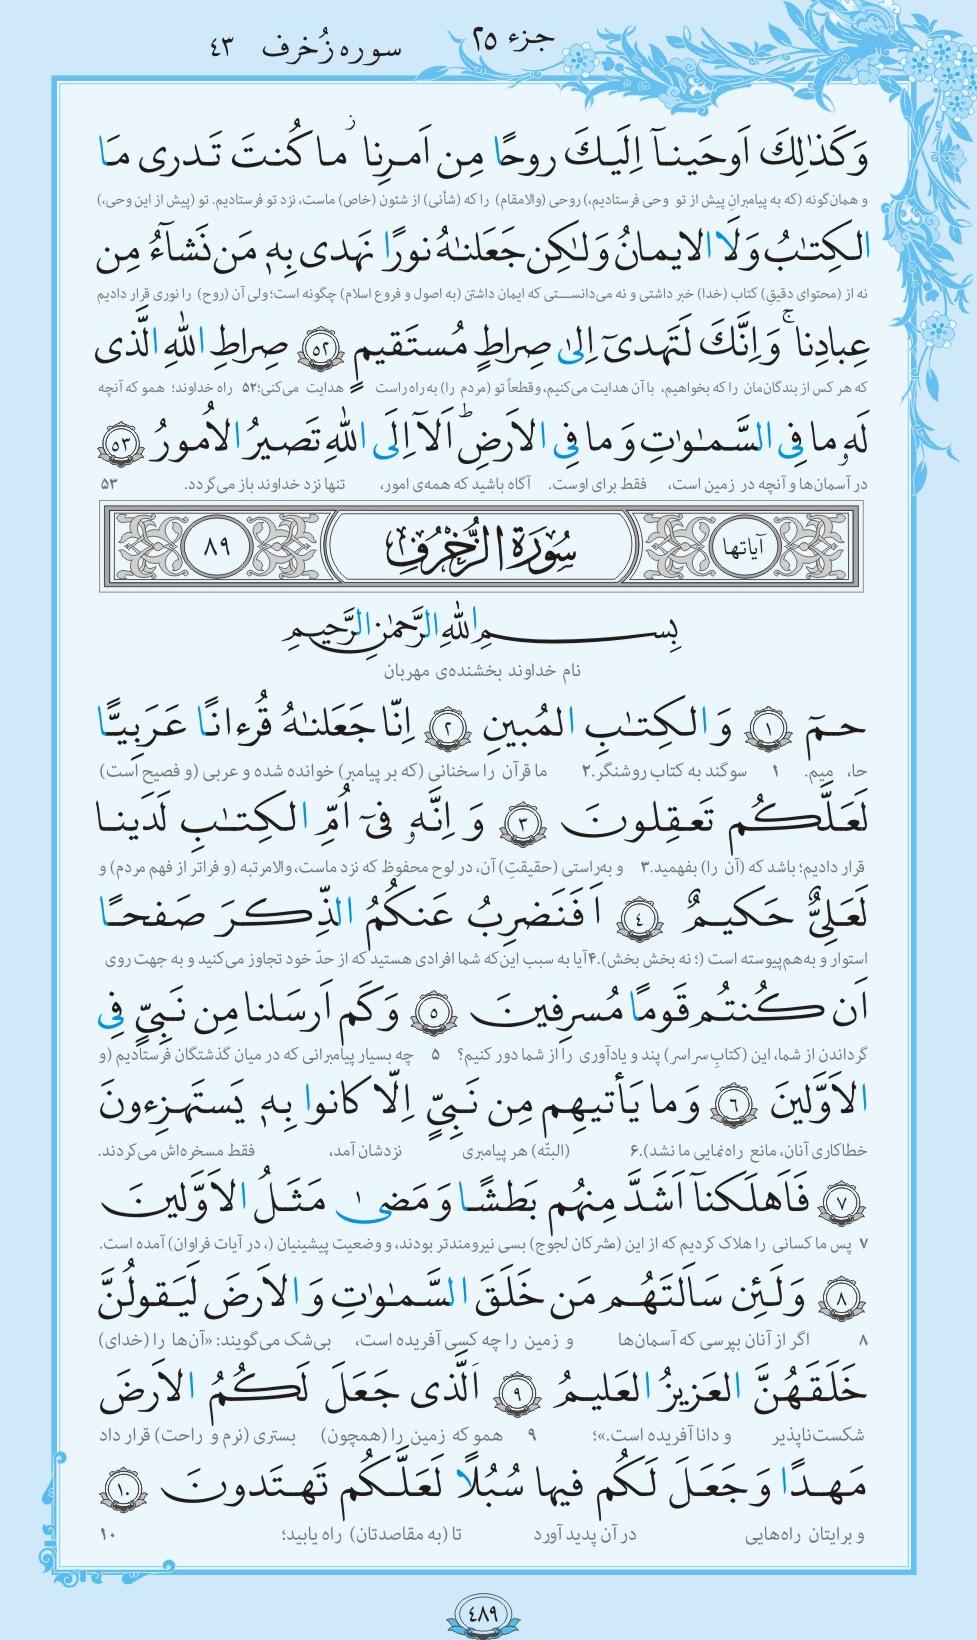 13990630000833 Test NewPhotoFree - ترتیل صفحه ۴۸۹ قرآن کریم+فیلم و متن آیات